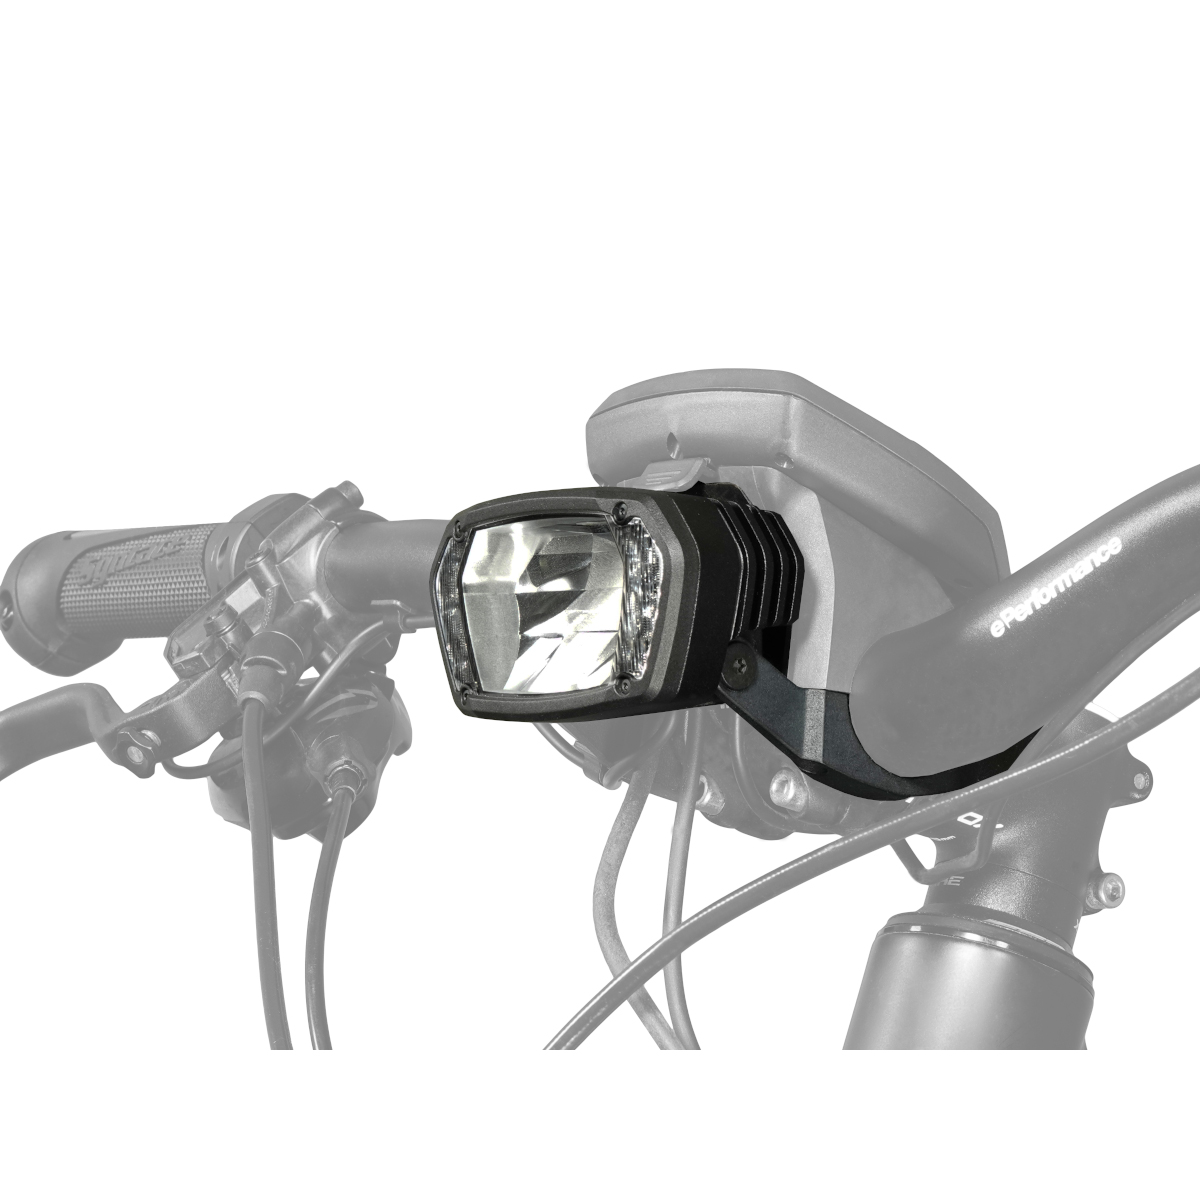 Image of Lupine SL X Bosch E-Bike Front Light - Intuvia/Nyon